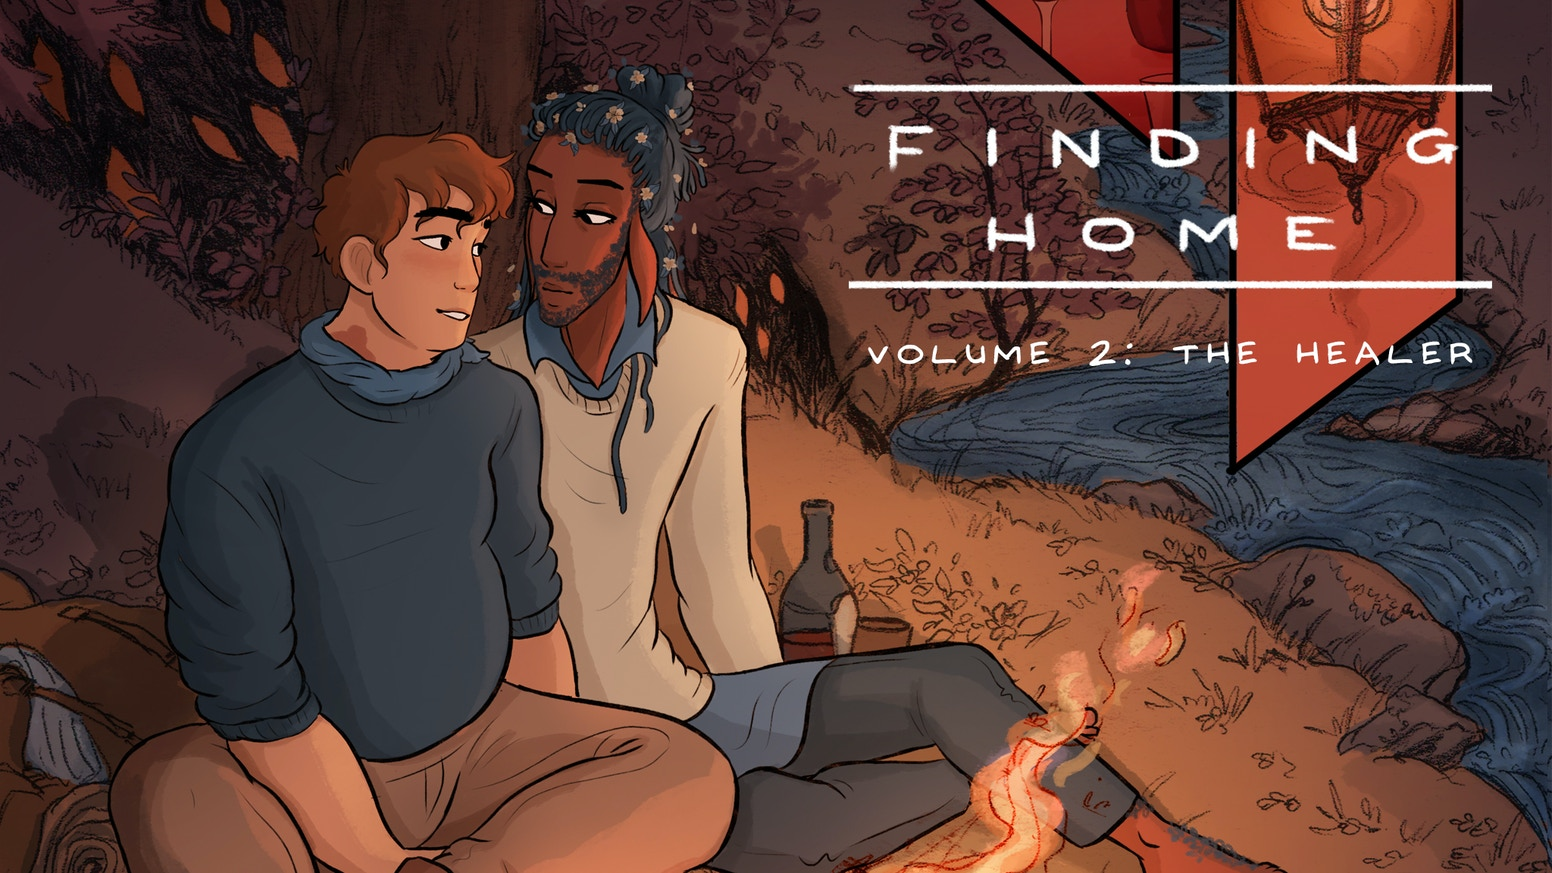 Volume 2 of the award-winning LGBT romance comic, printed as a graphic novel.